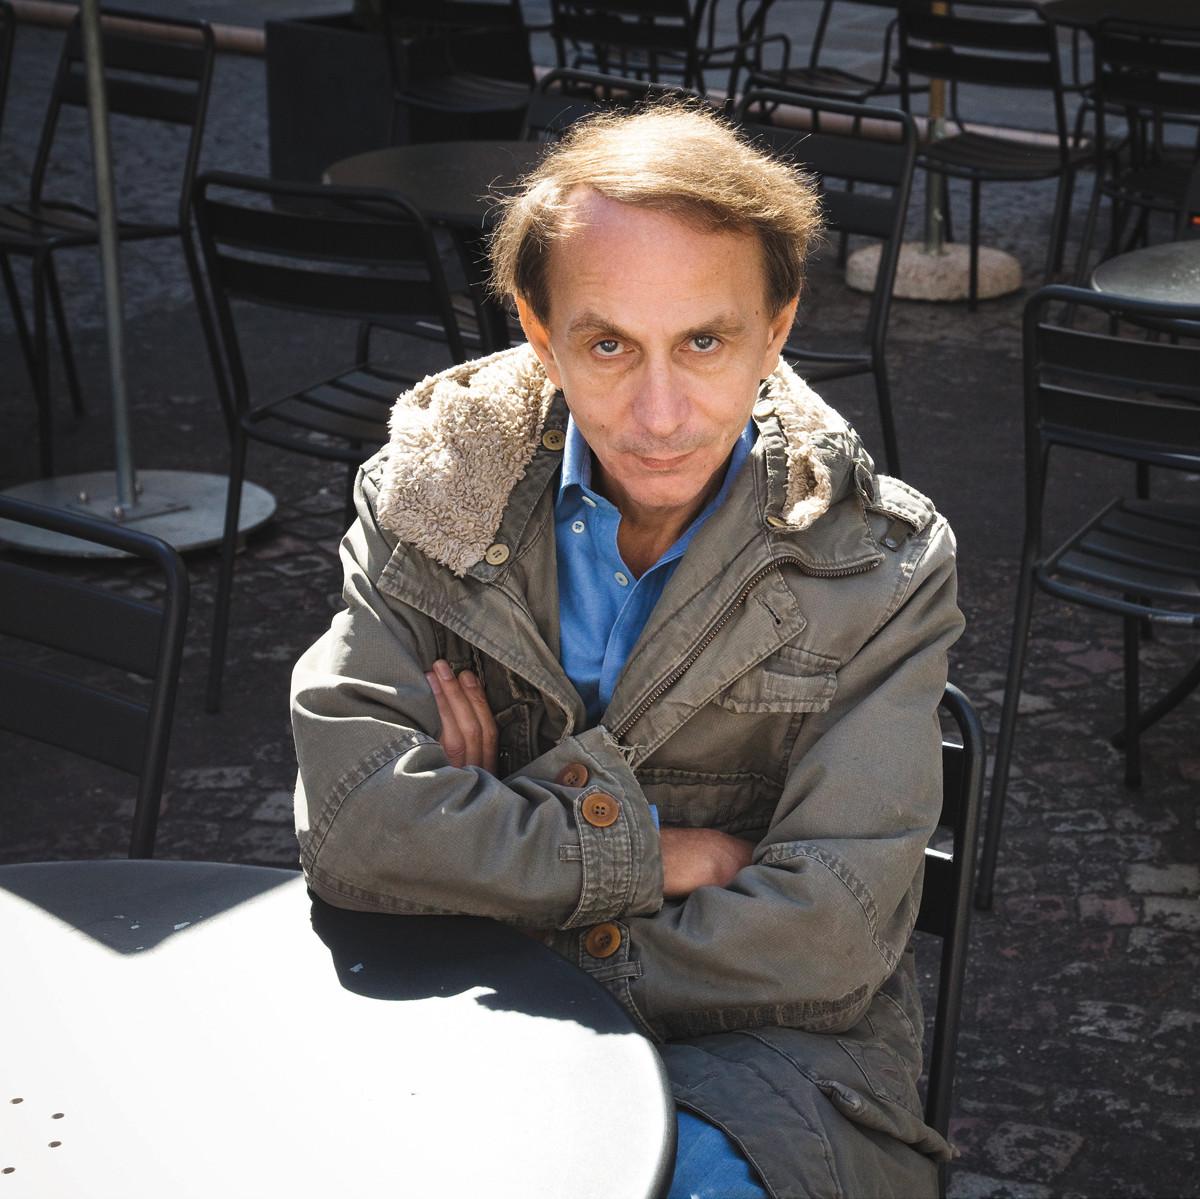 Michel houellebecq philippe matsas flammarion